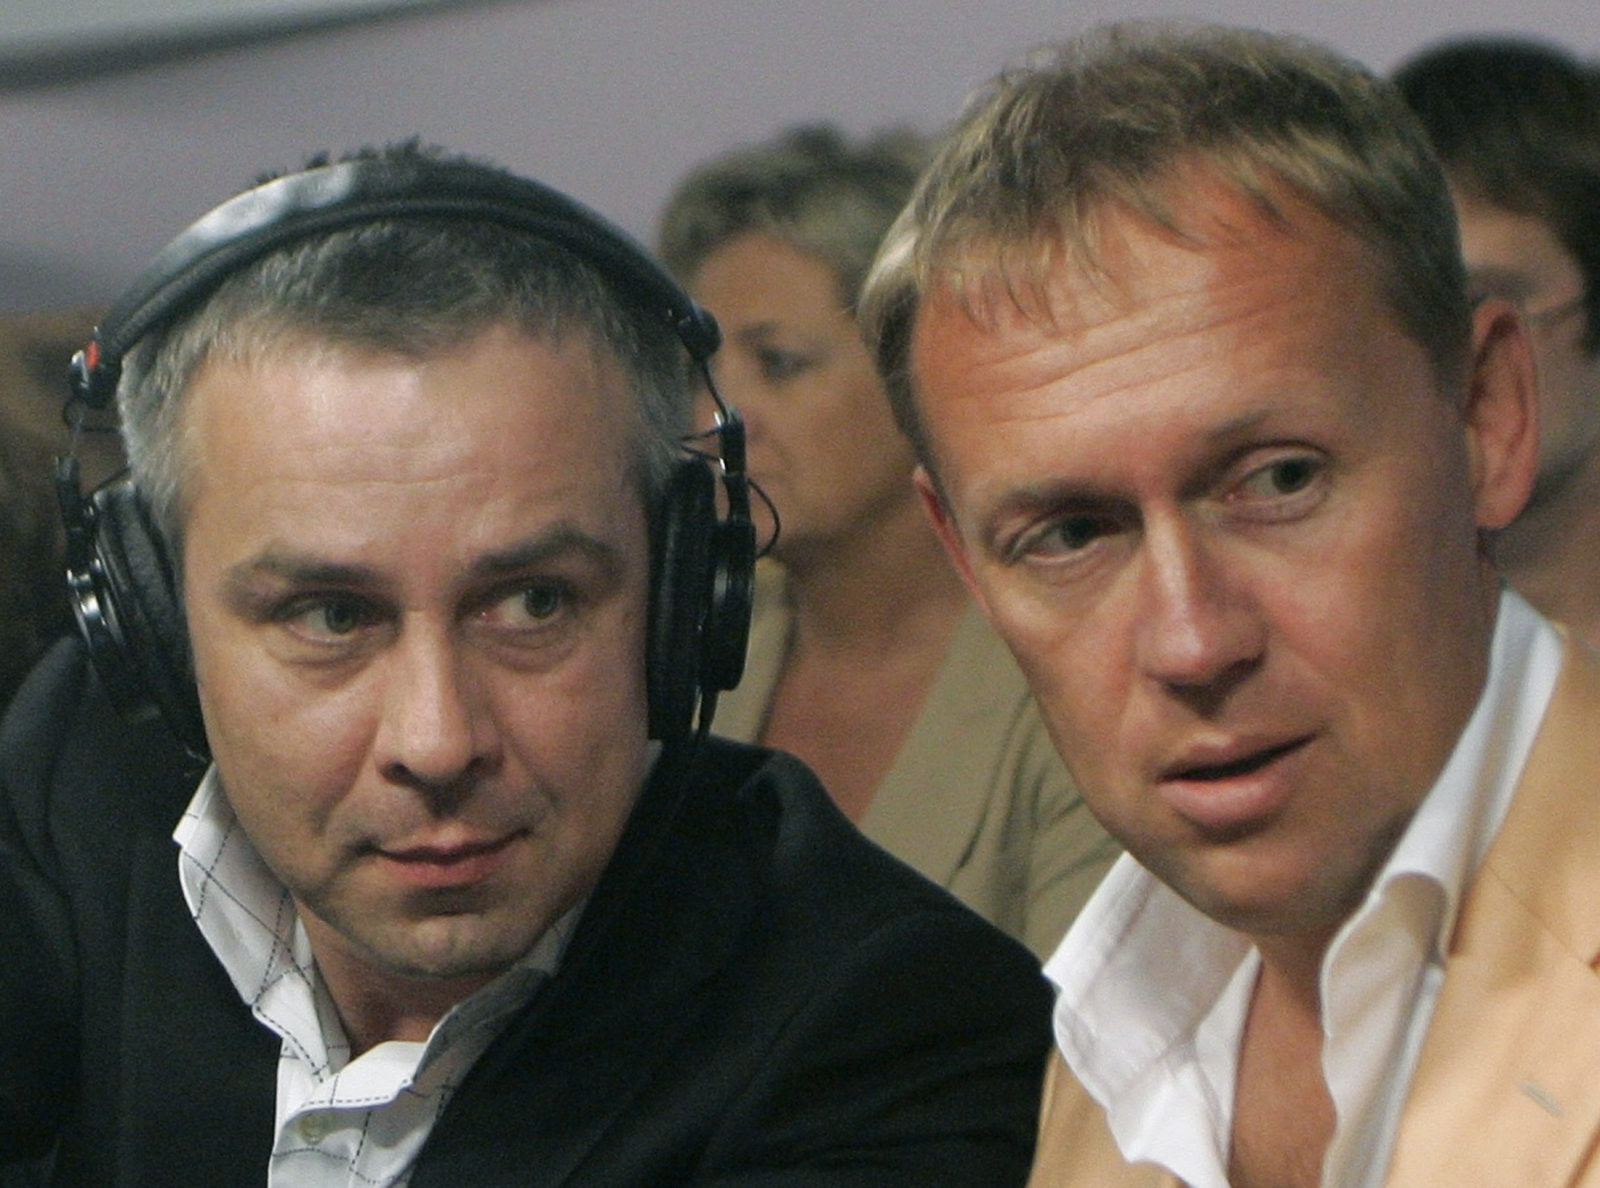 Andrei Lugovoy and Dmitry Kovtun